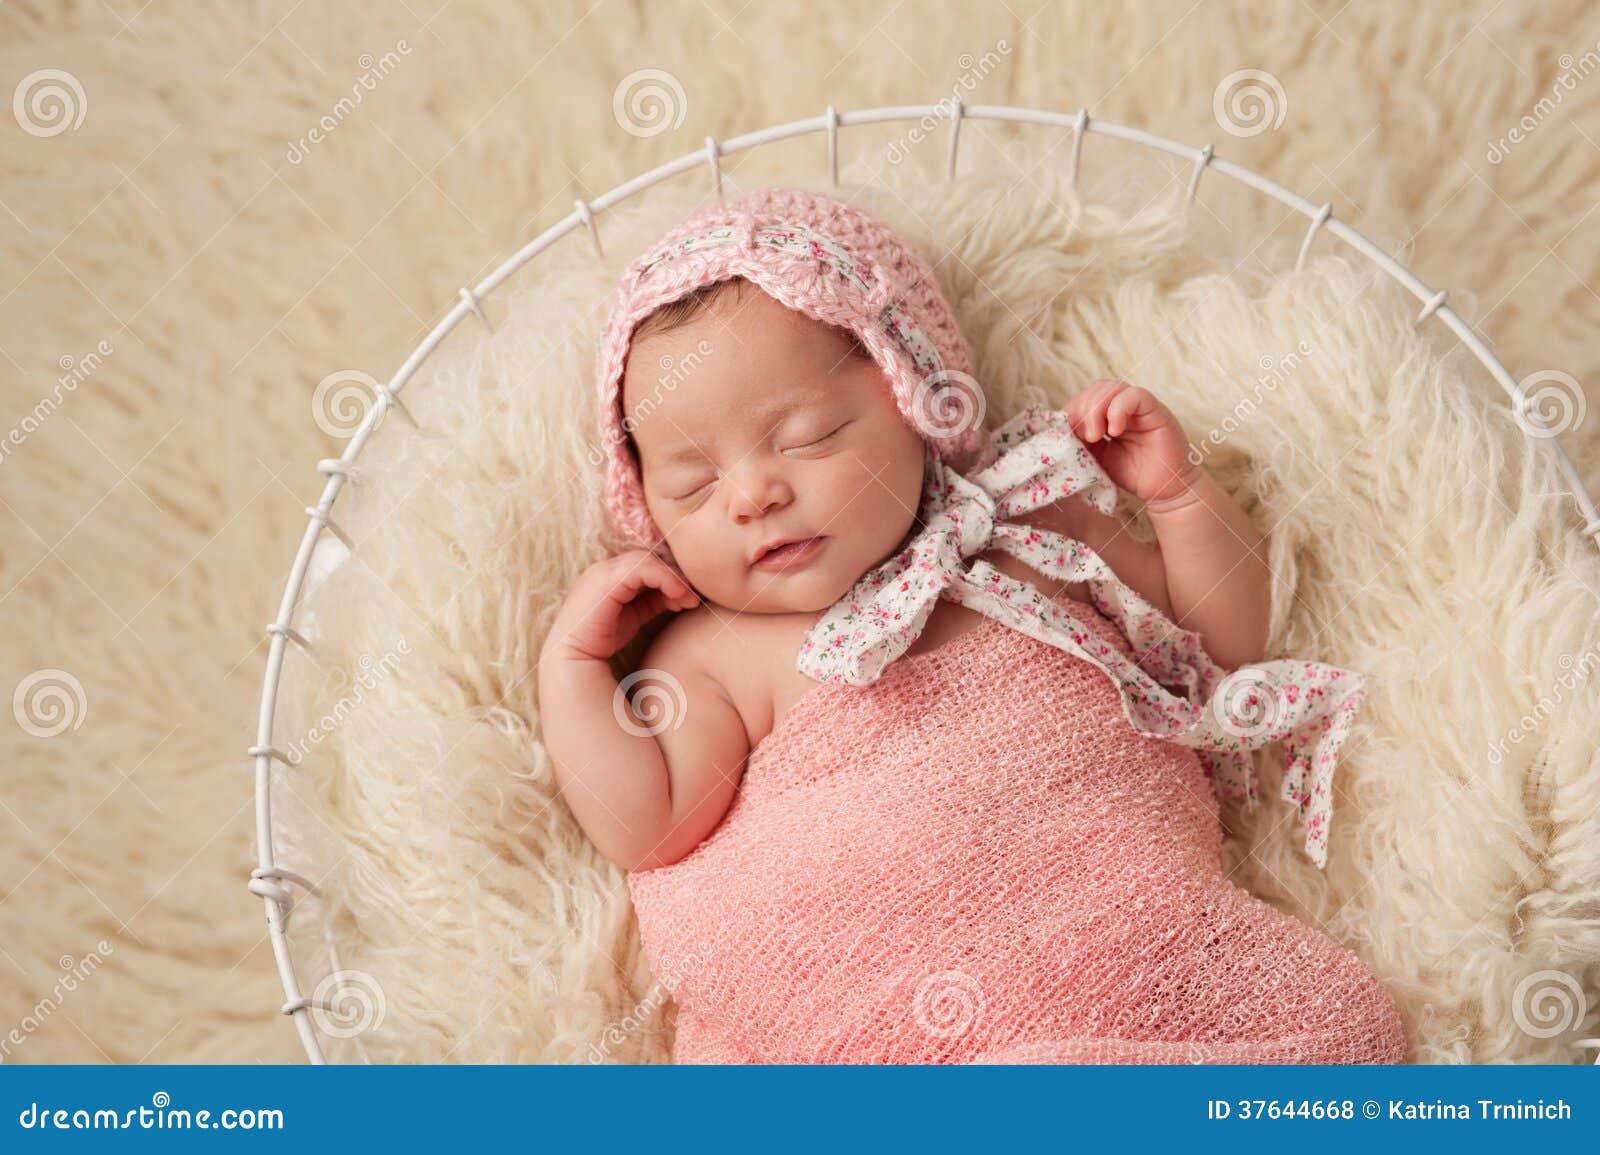 Newborn Baby Girl In Basket Wearing A Pink Bonnet Stock